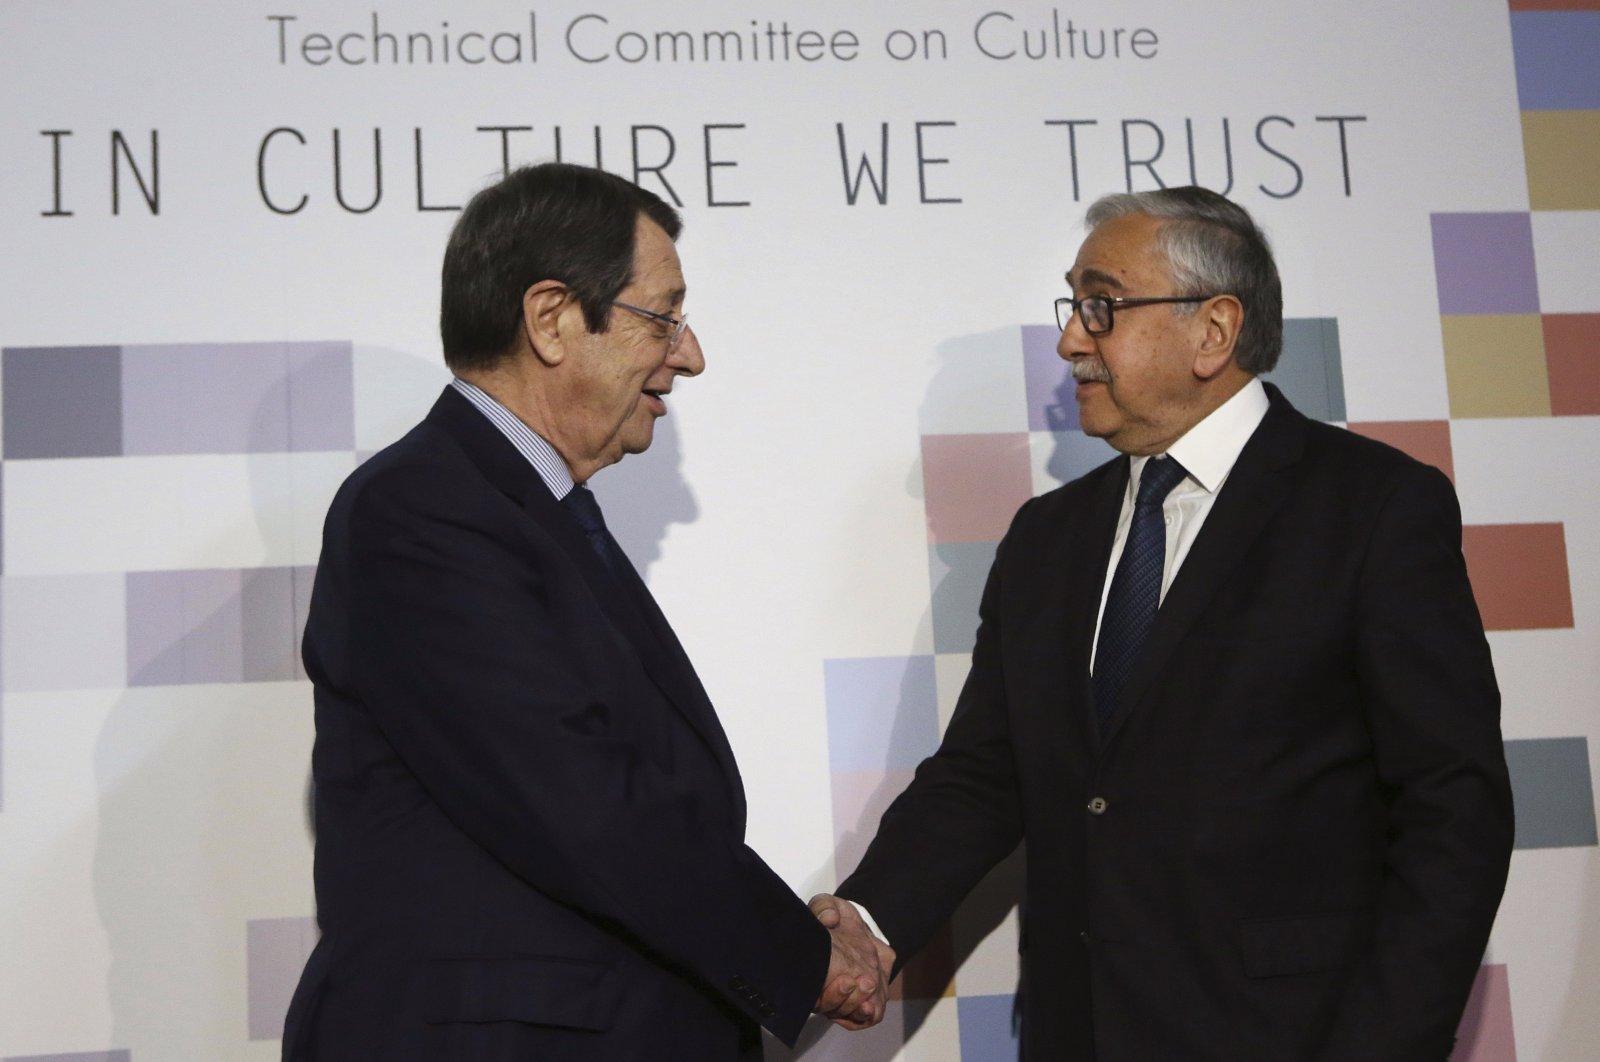 Greek Cypriot leader Nicos Anastasiades, left, and Turkish Cypriot President Mustafa Akıncı, shake hands in Nicosia, Feb. 3, 2020. (AP Photo)